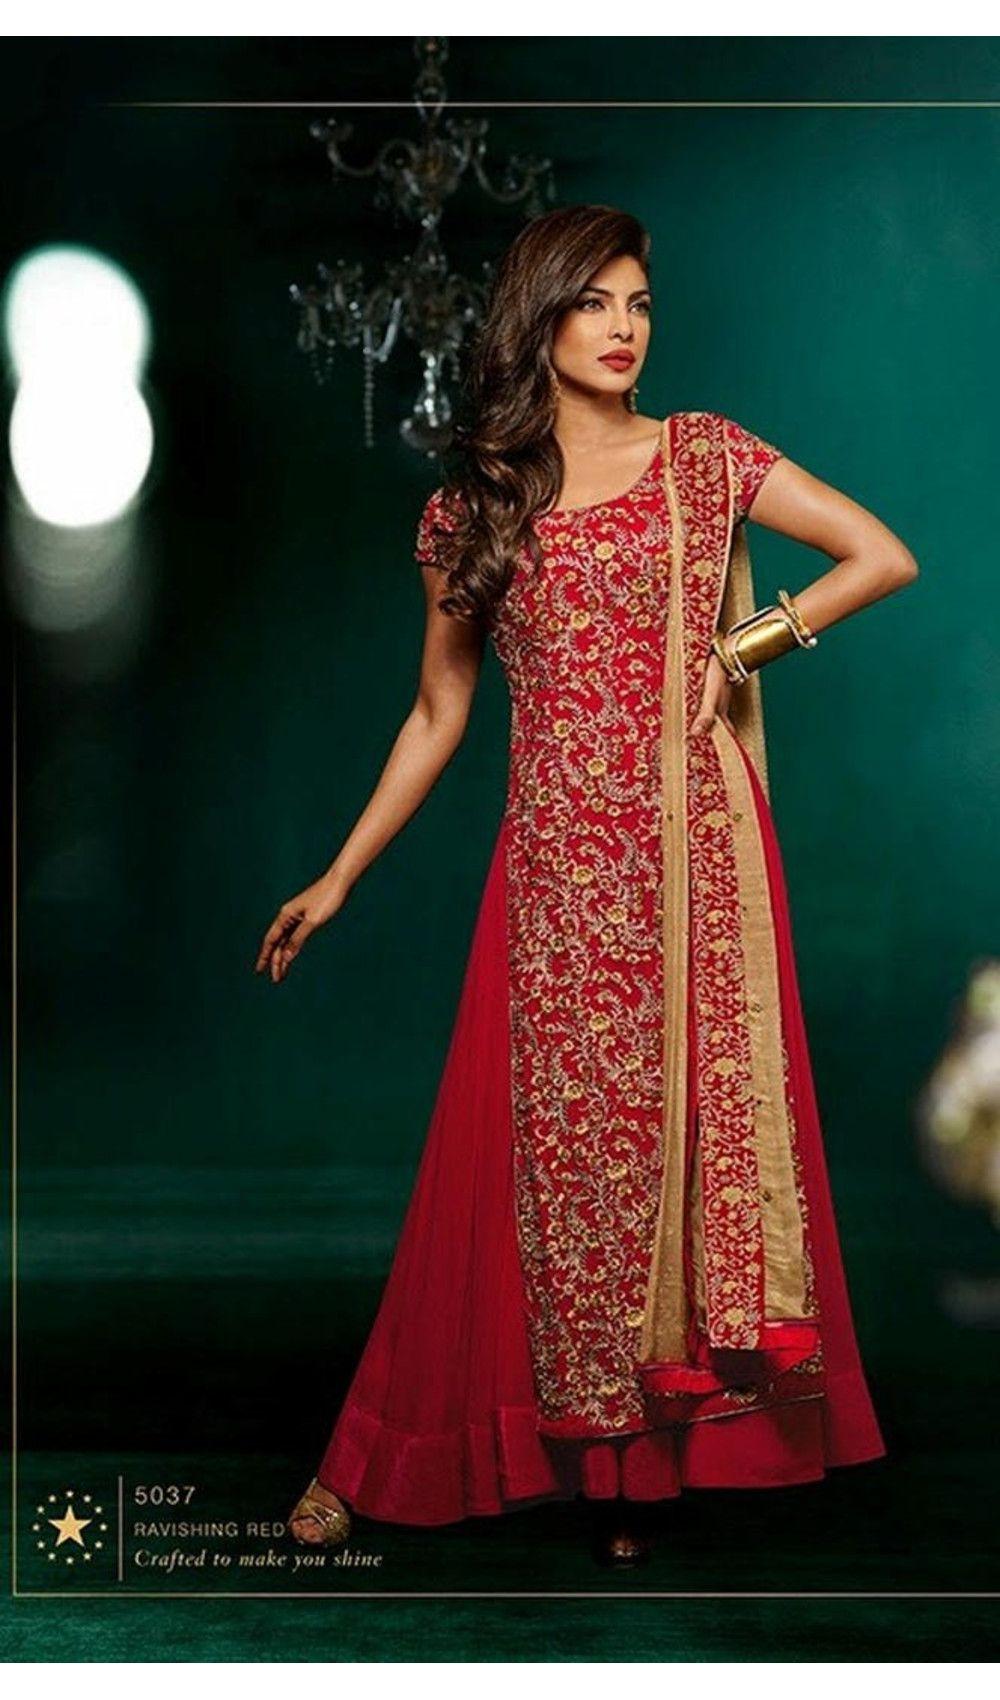 f7b243fb57 Delightful Red Priyanka Chopra Georgette Anarkali Style Suits ...